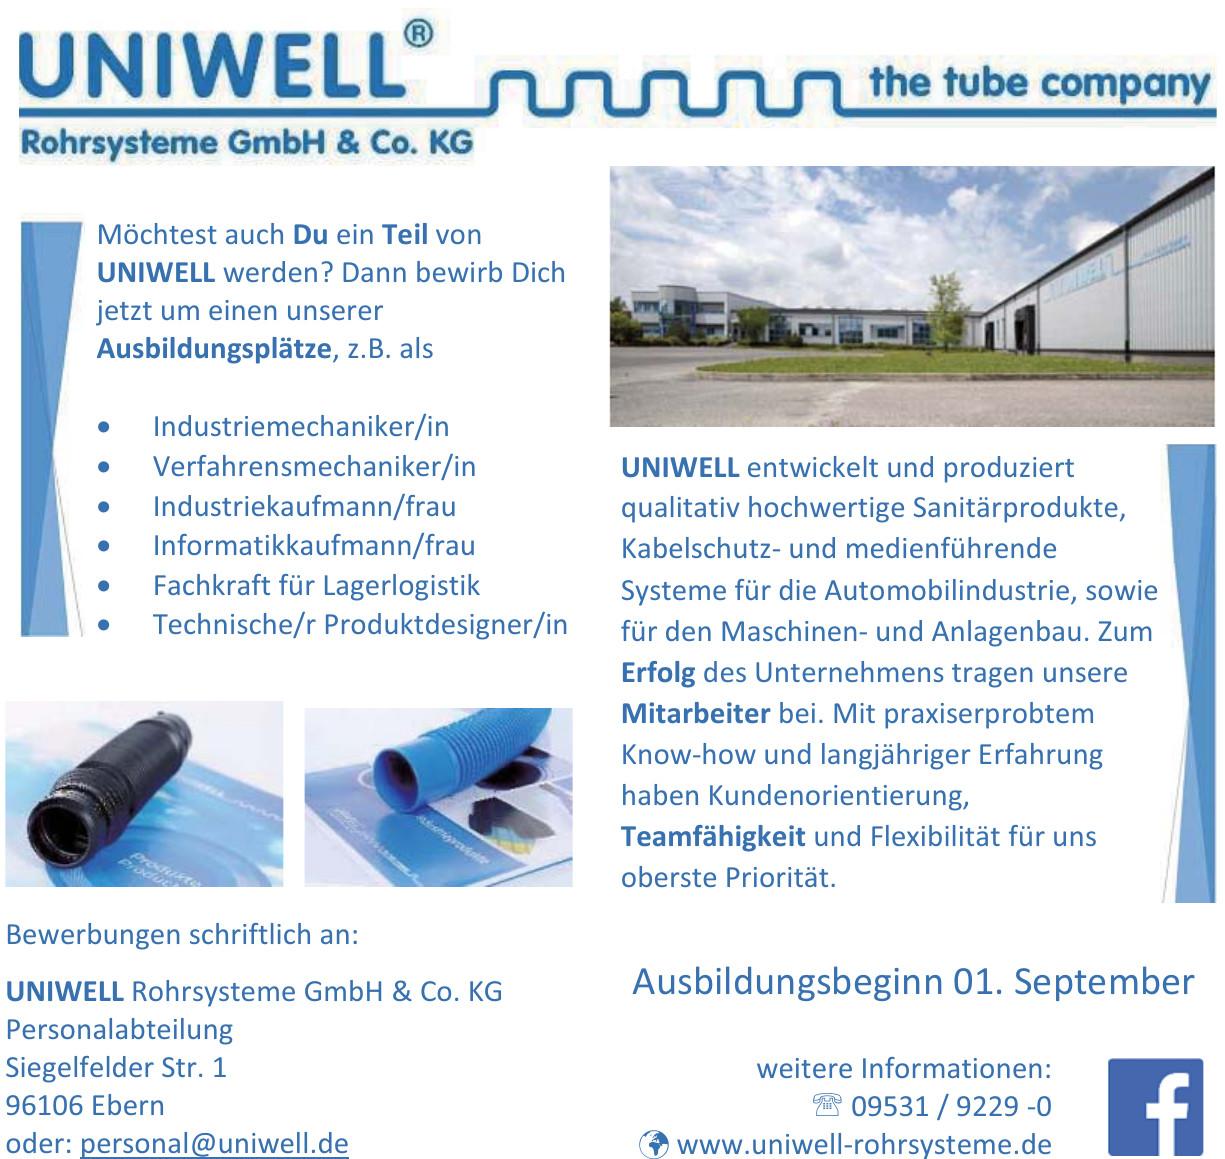 Uniwell Rohrsysteme GmbH & Co. KG